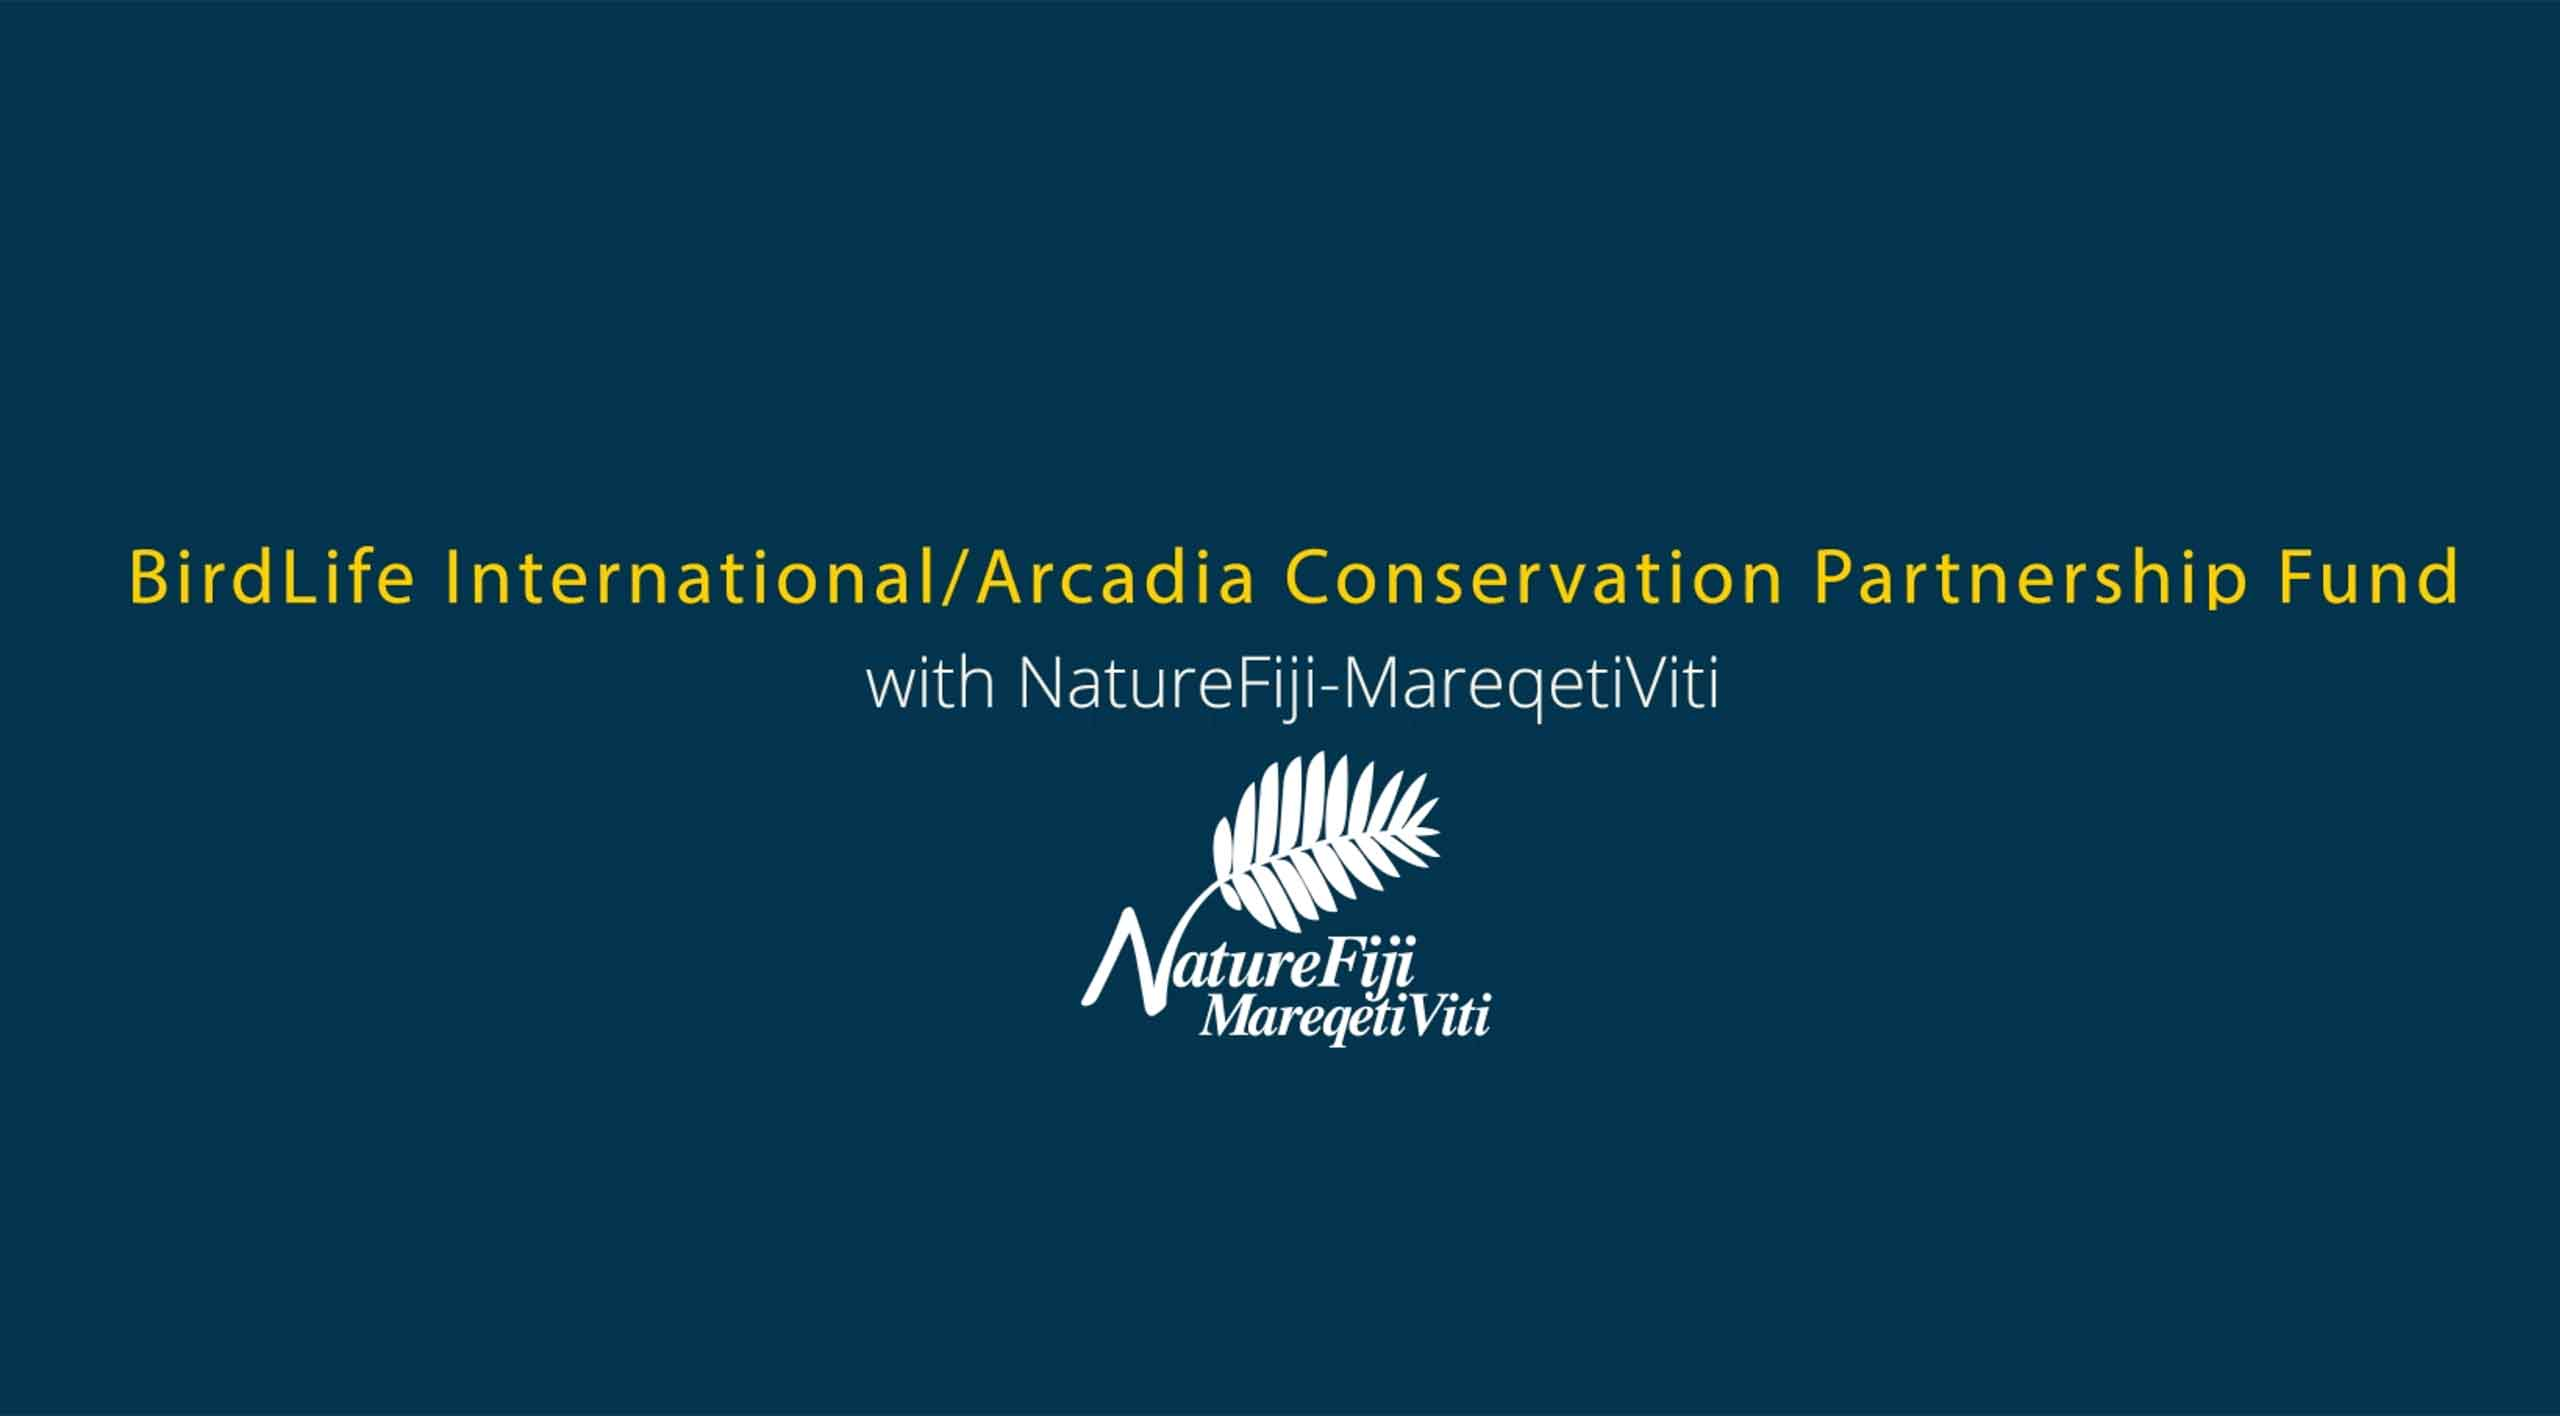 Arcadia Fund, NFMV